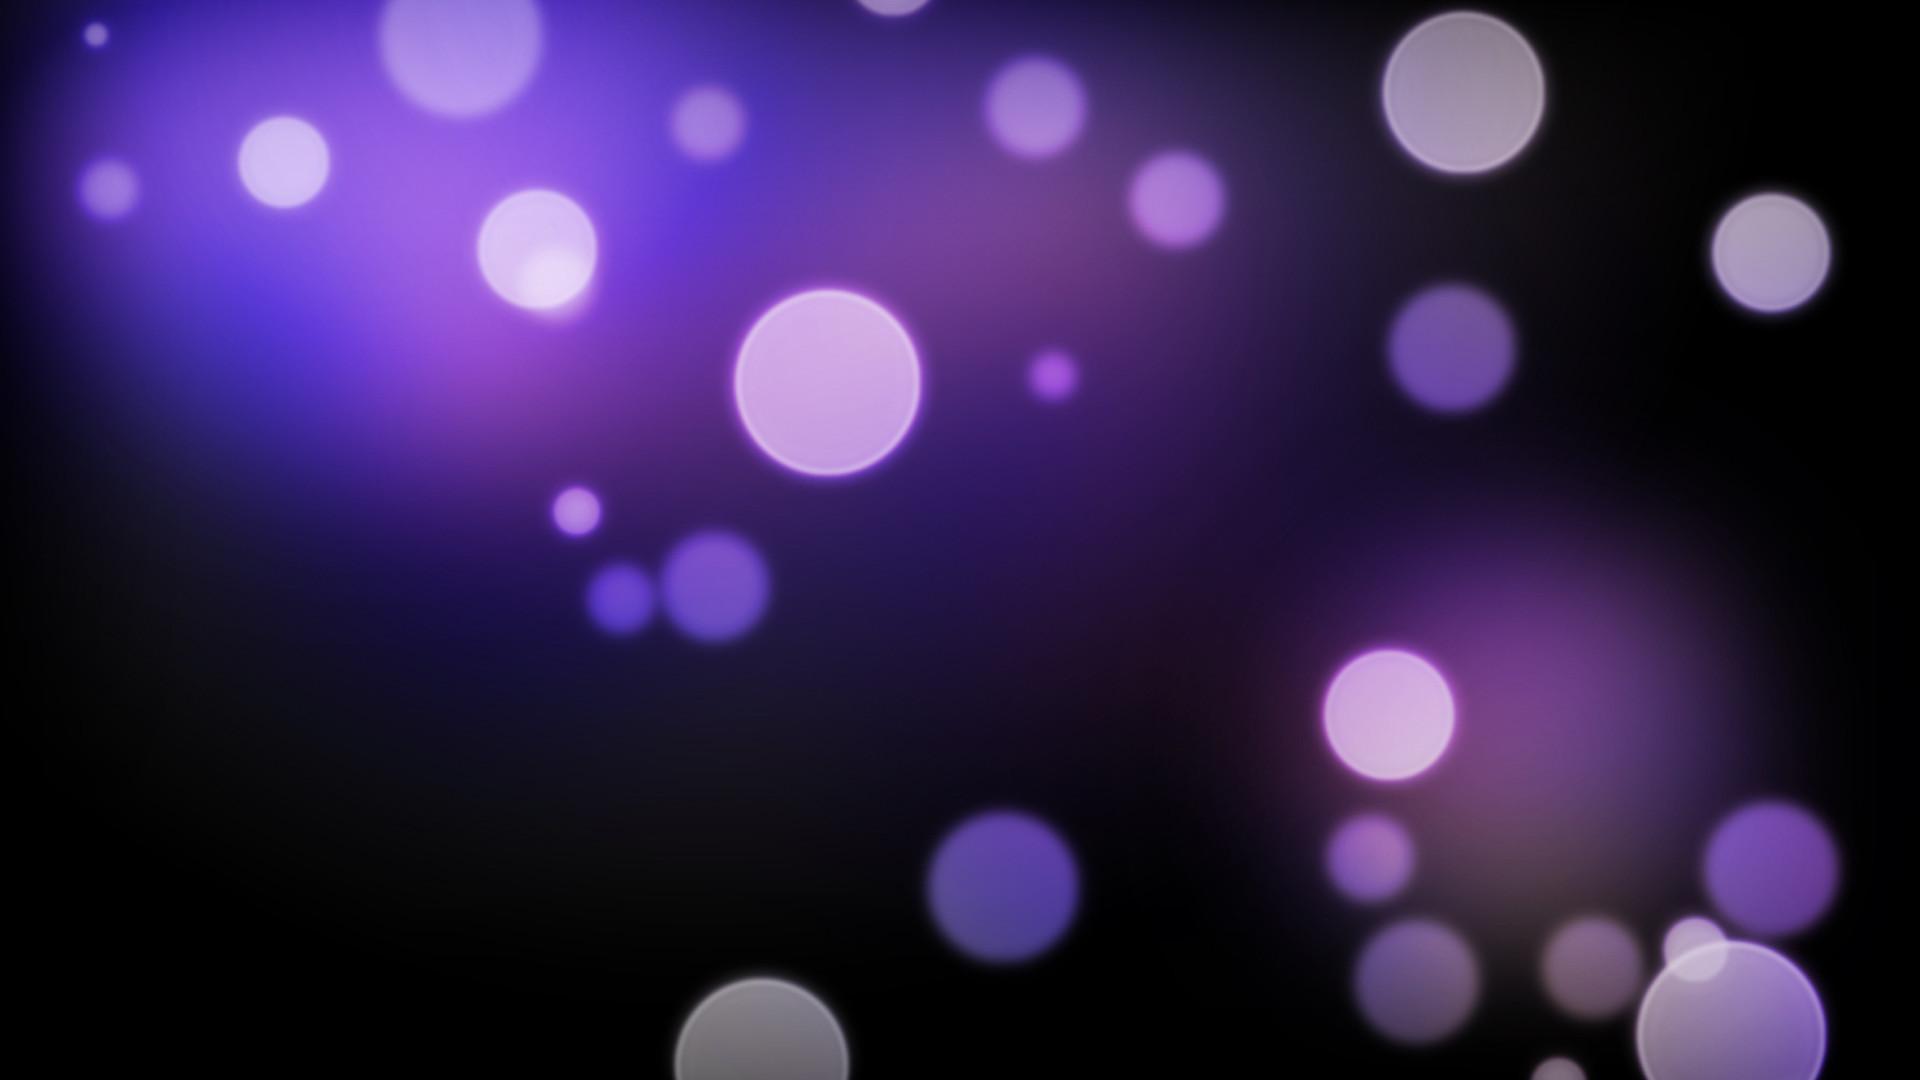 dark solid purple wallpaper (65+ images)